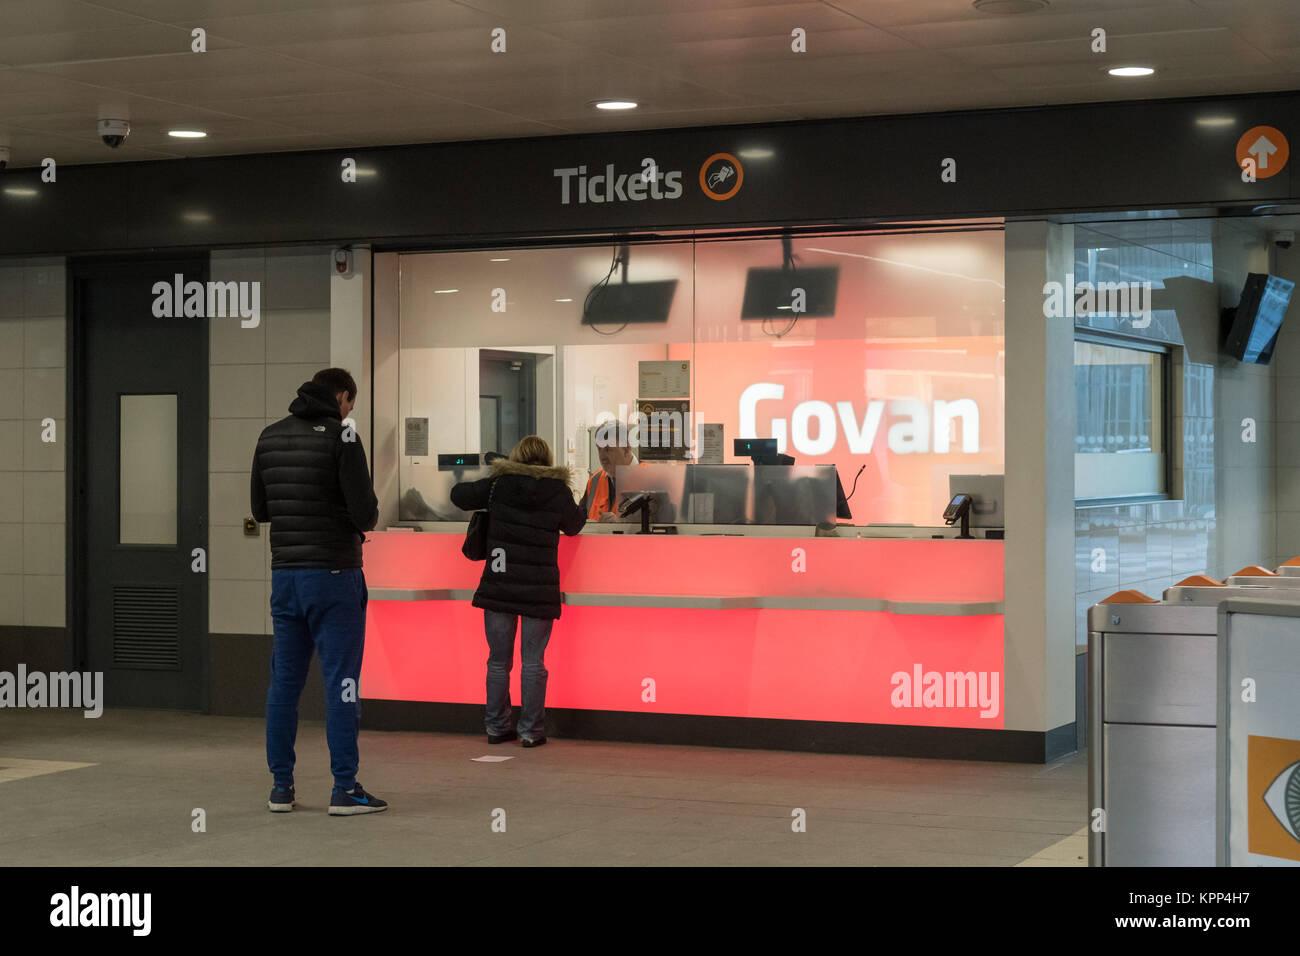 Govan subway station, Glasgow, Scotland, U - Stock Image